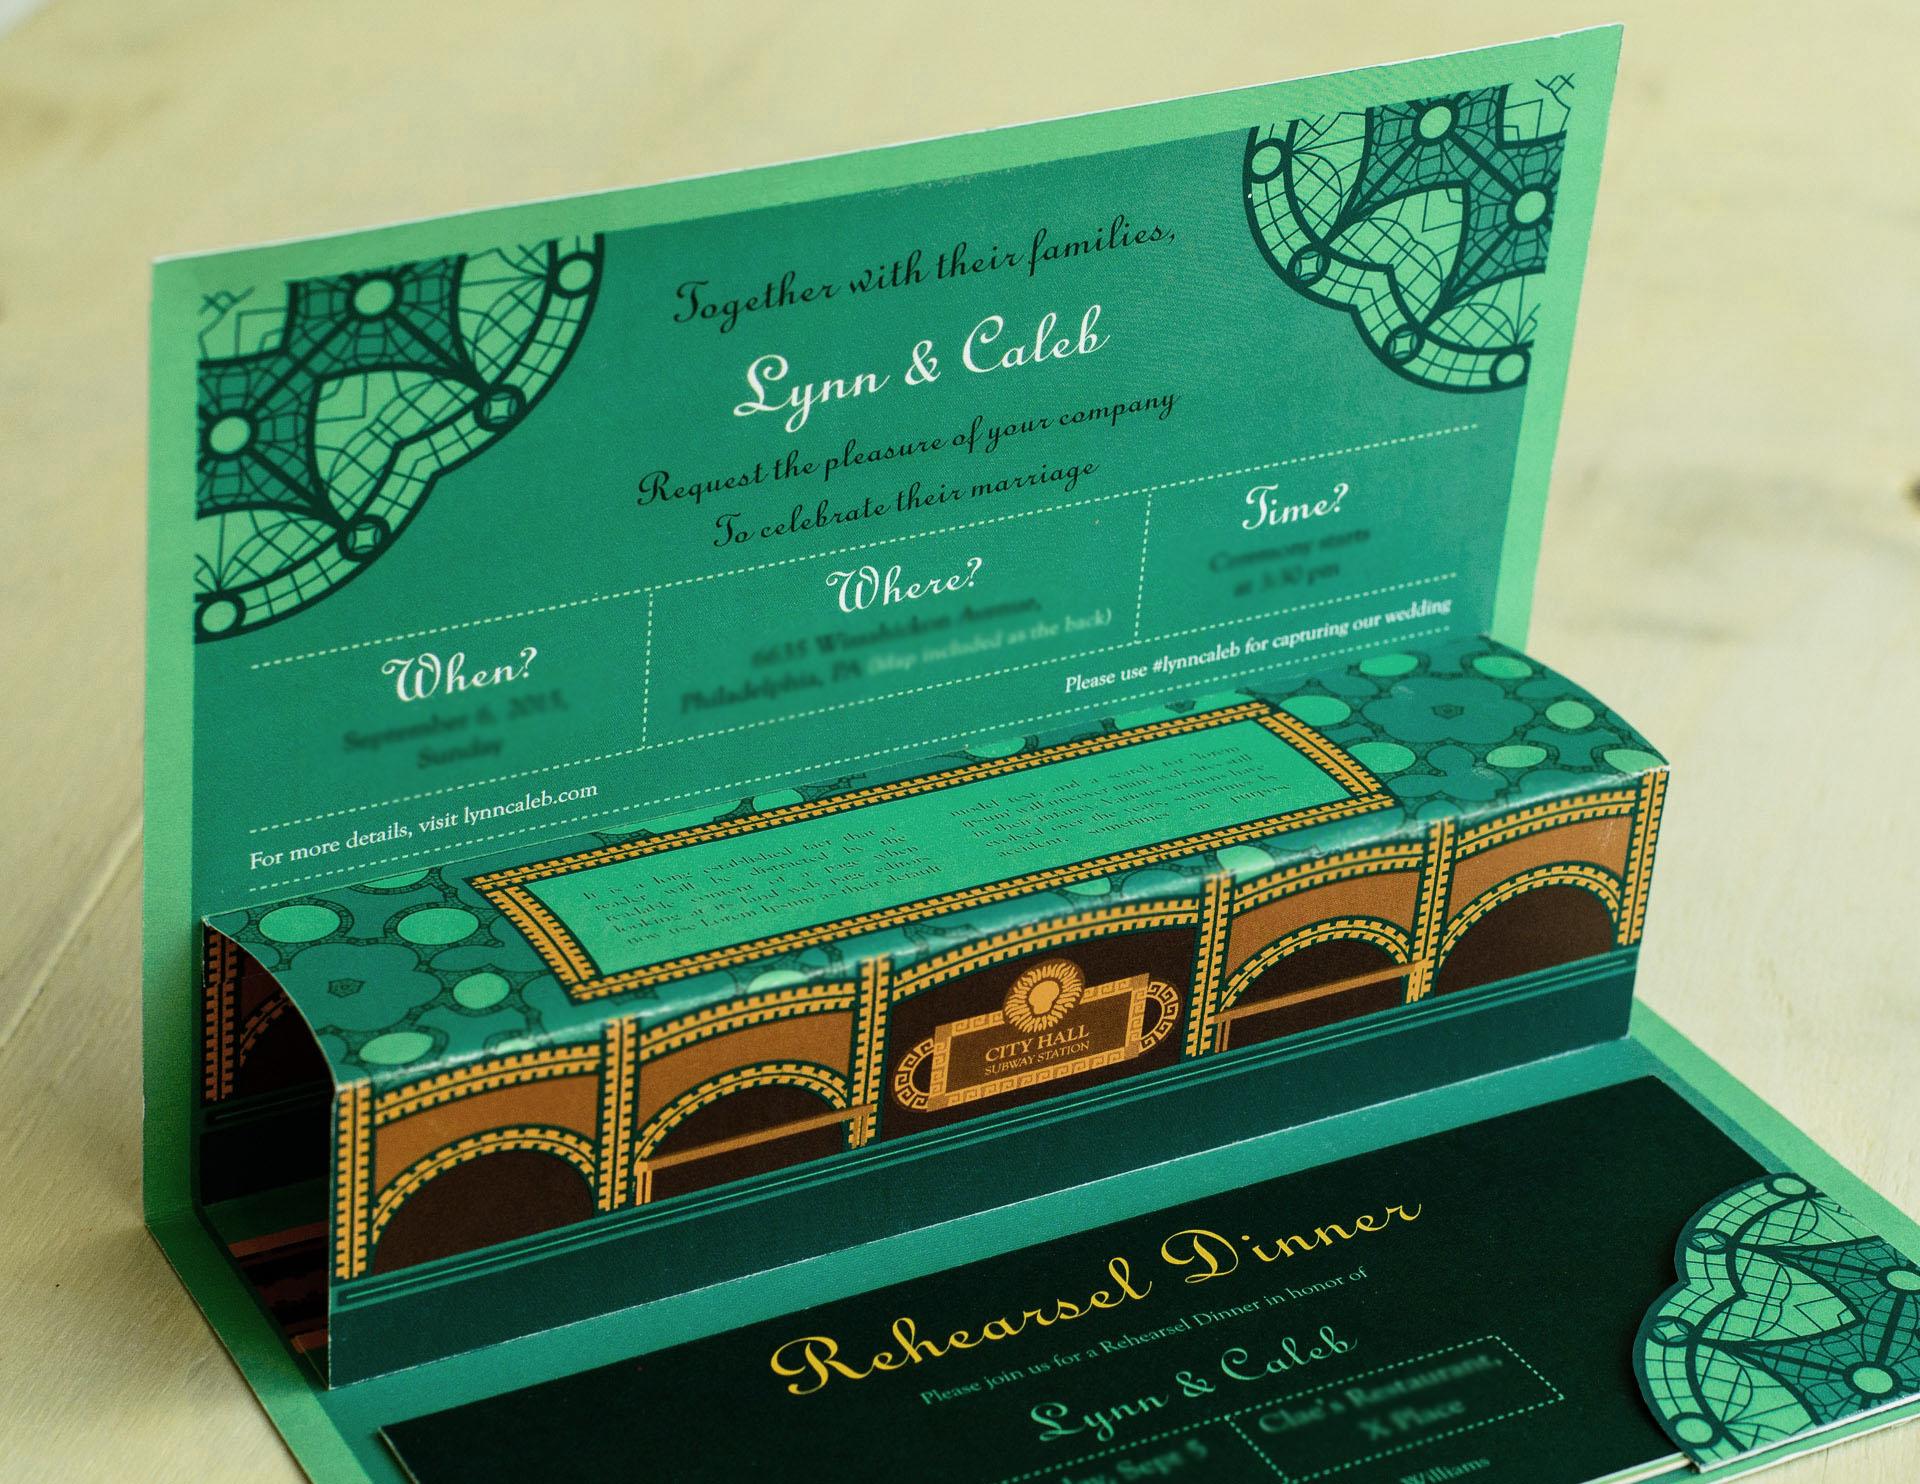 IM_Bangalore_Wedding_Invite_20150410_002-3 copy.jpg